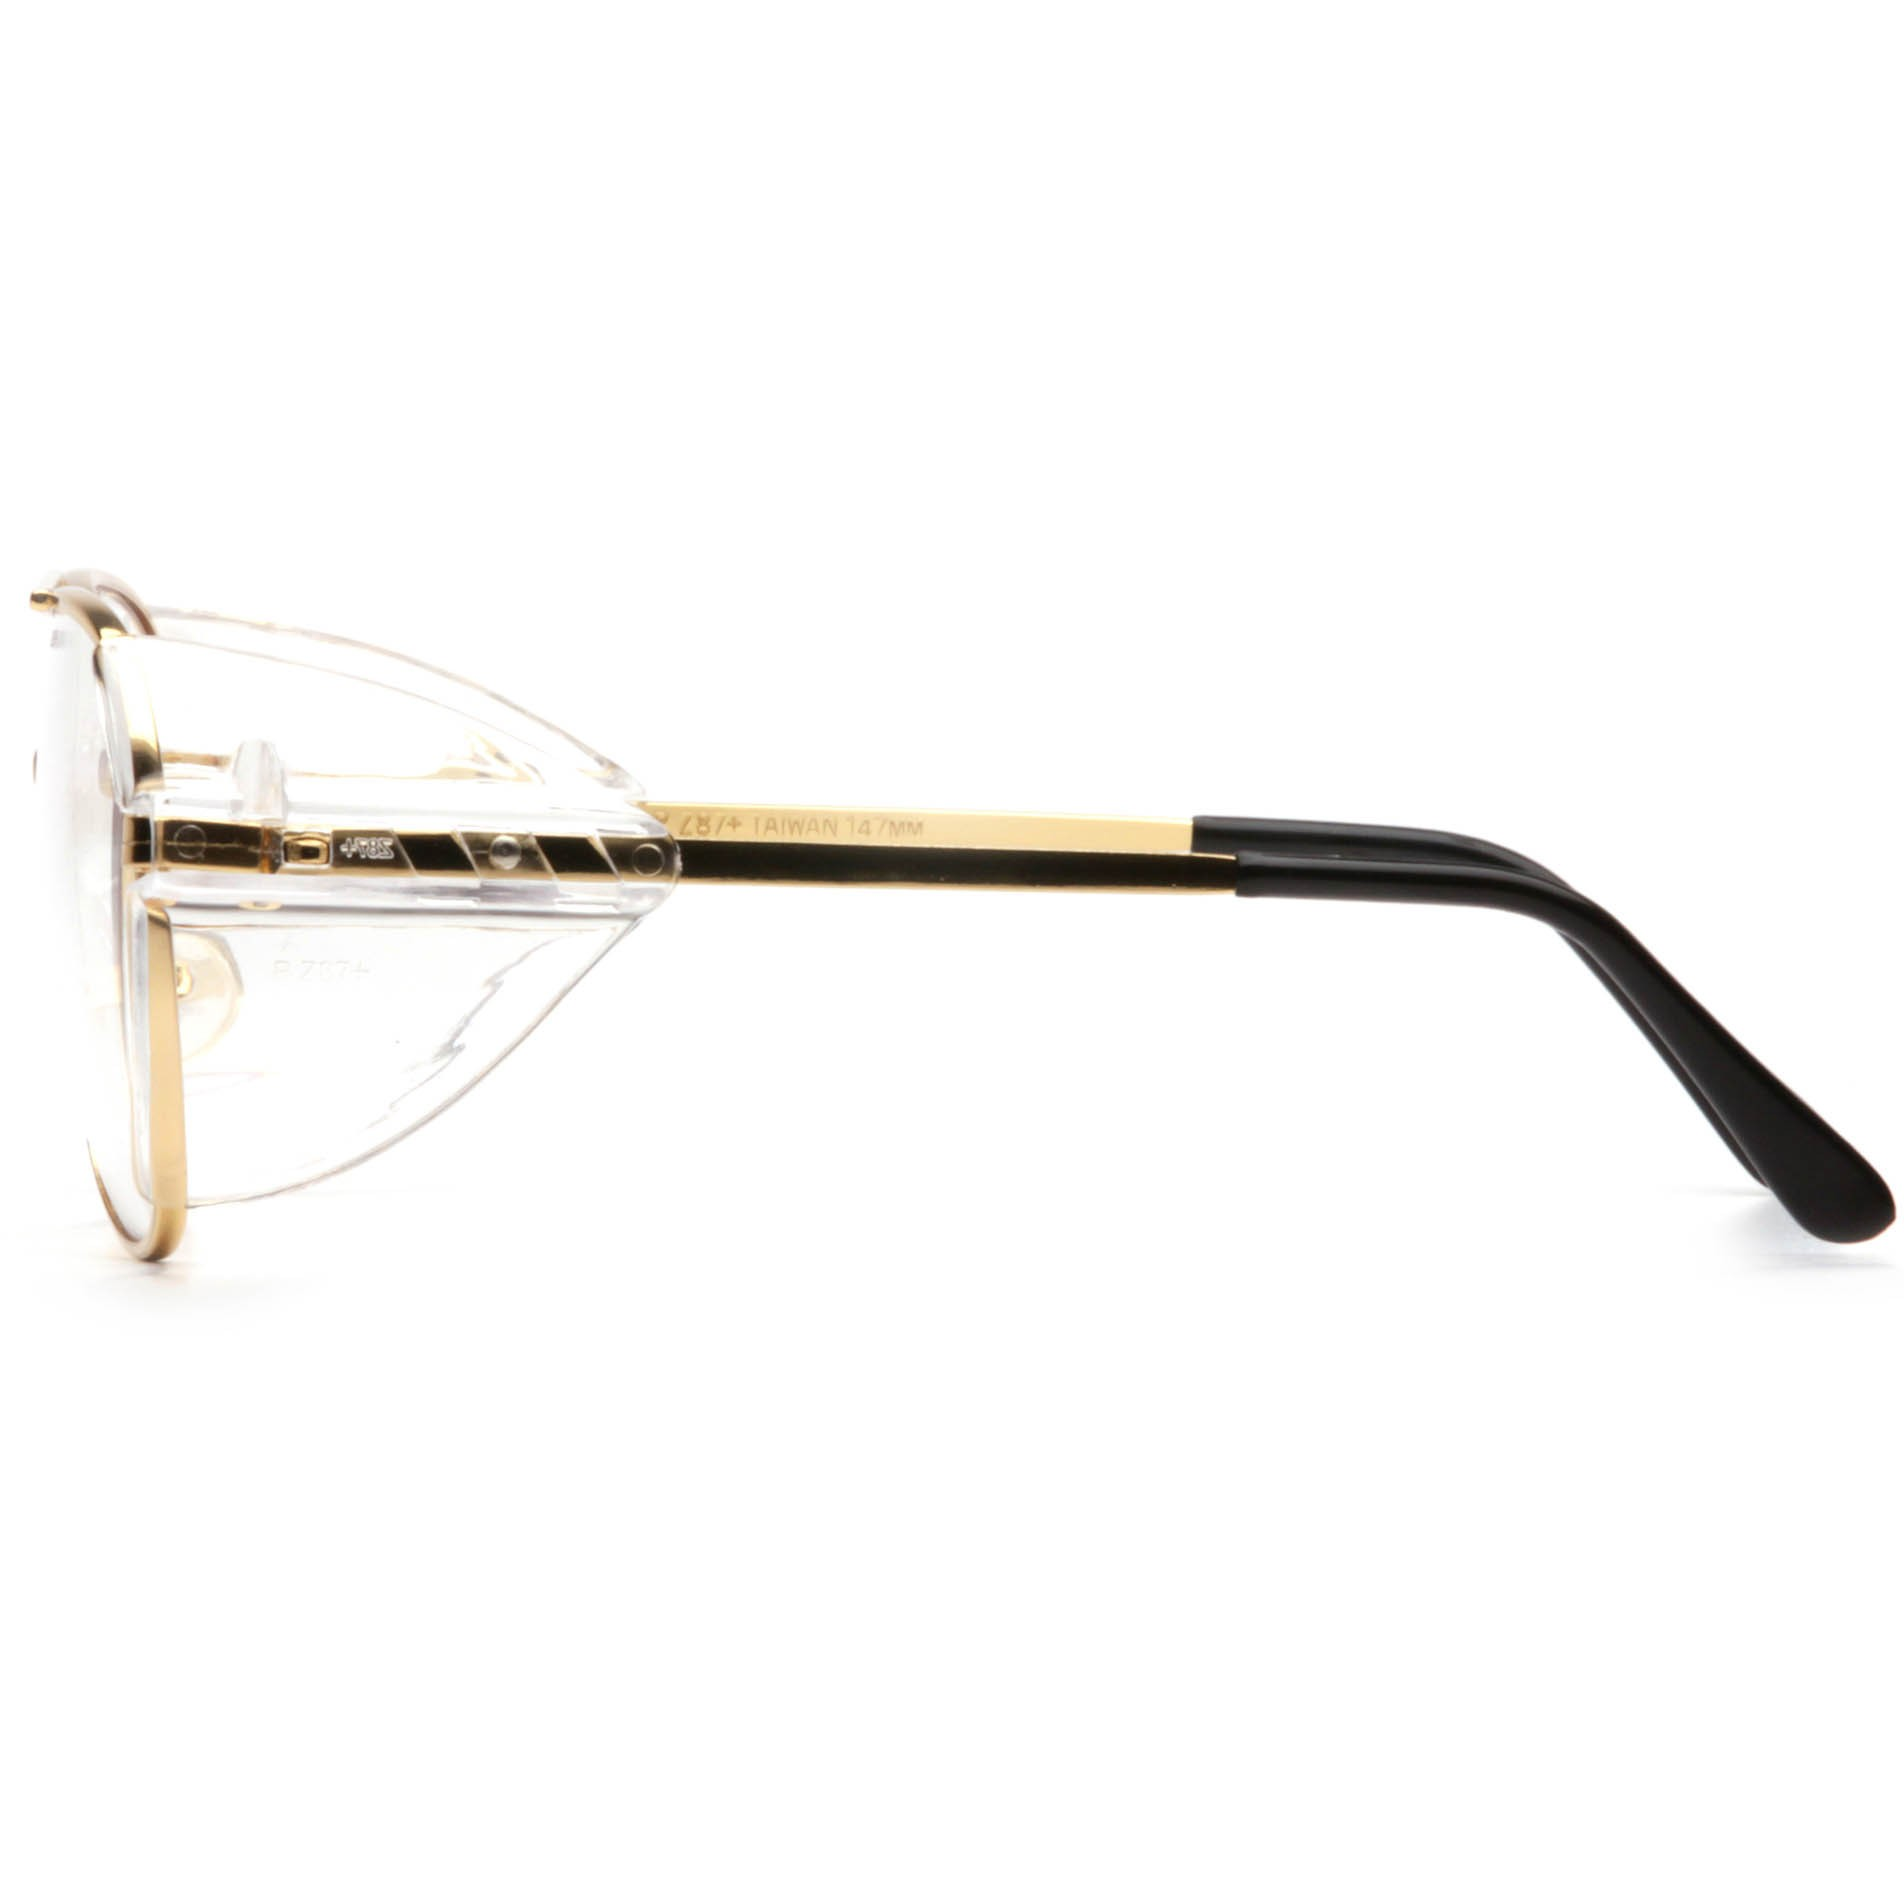 pyramex pathfinder safety glasses gold metal frame clear lens fullsourcecom